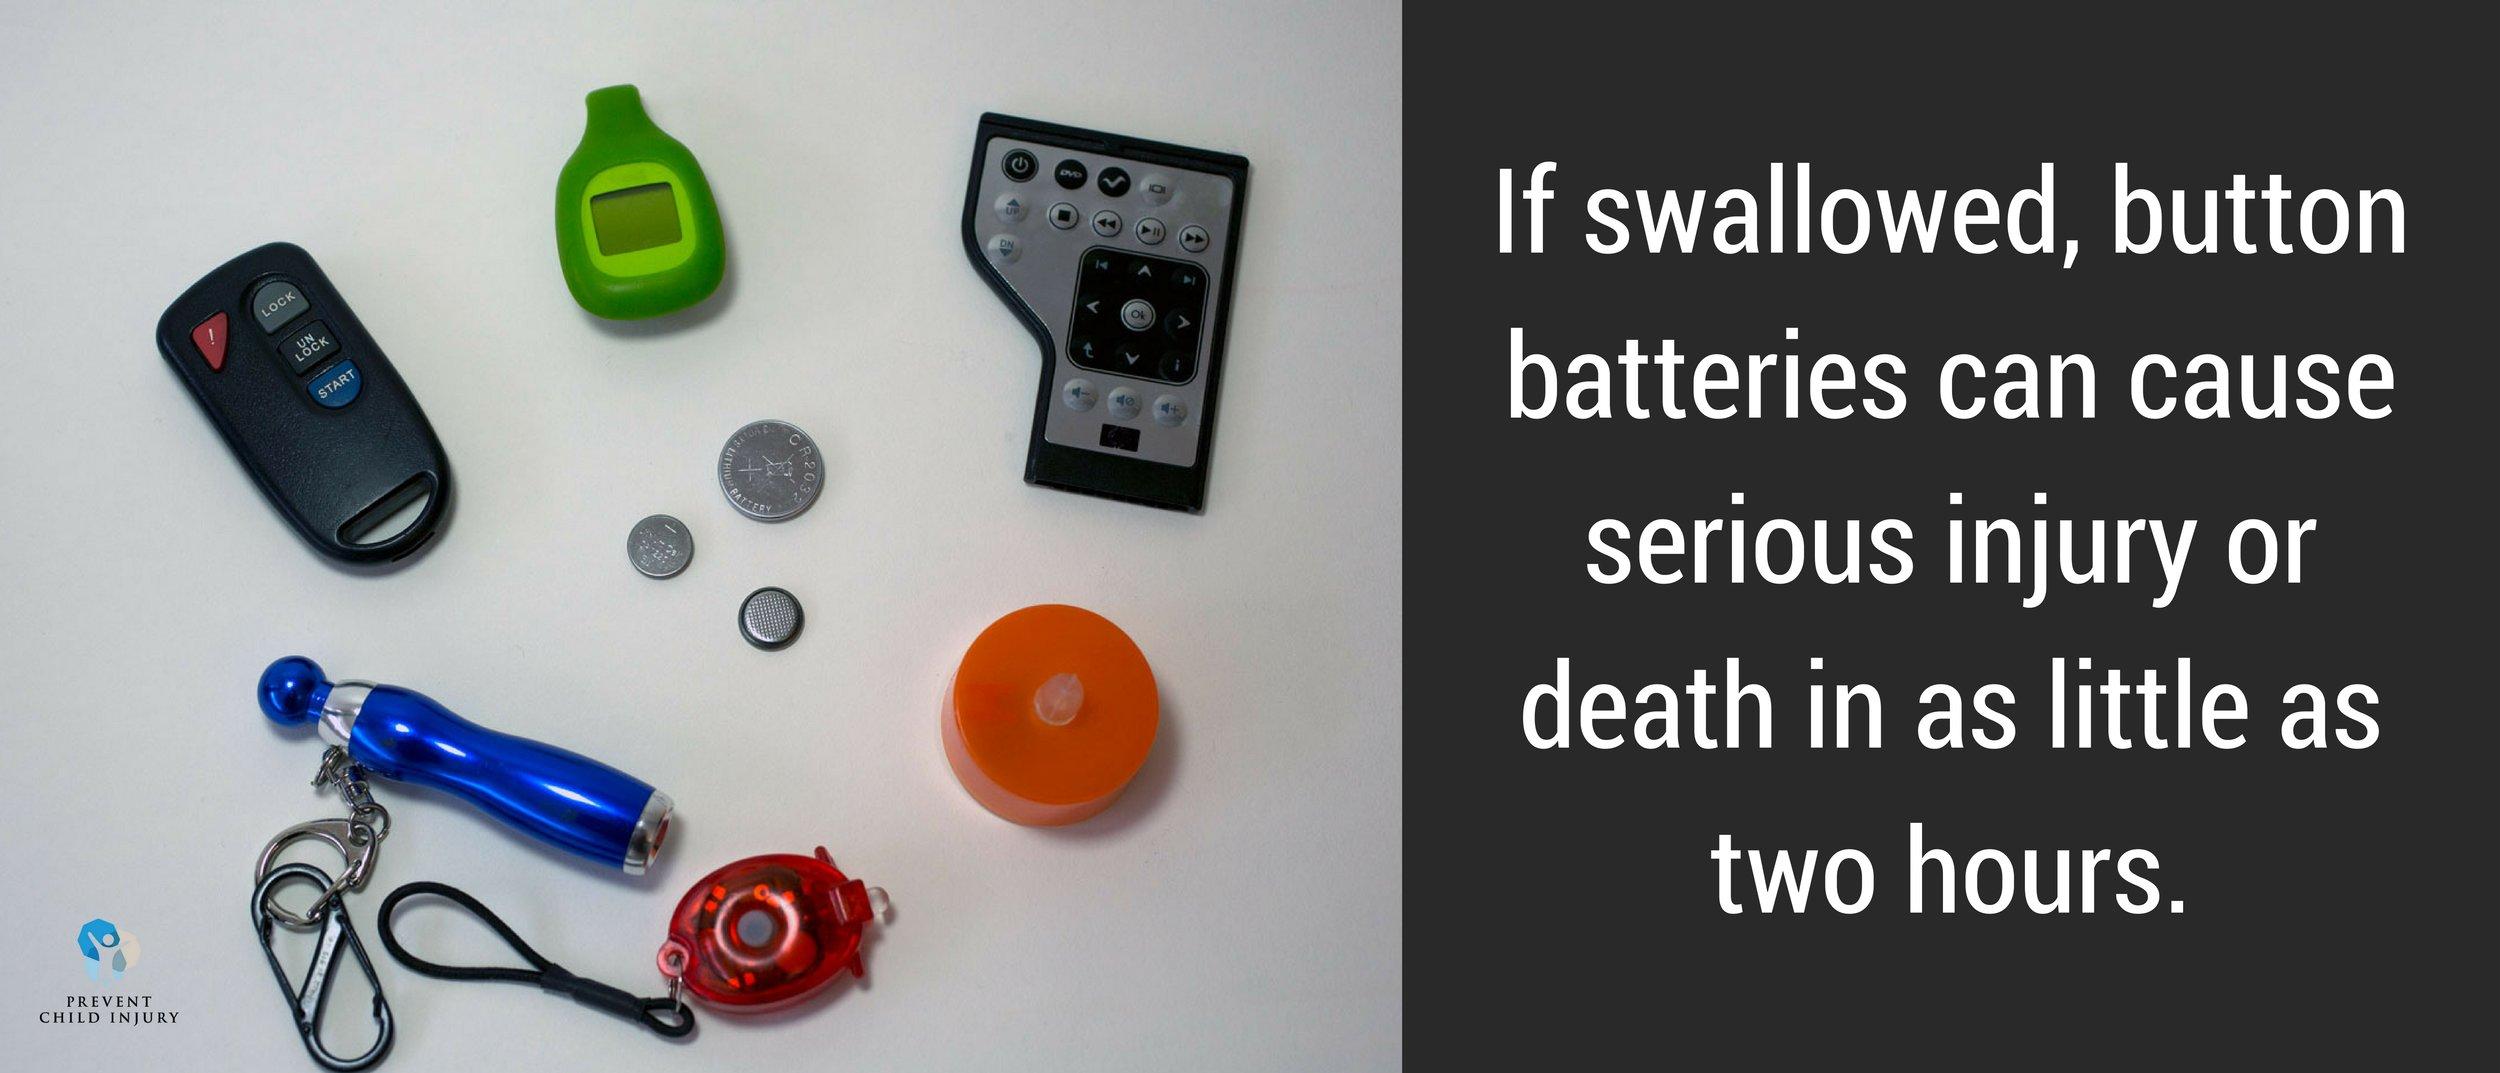 button-battery-header-graphic.jpg